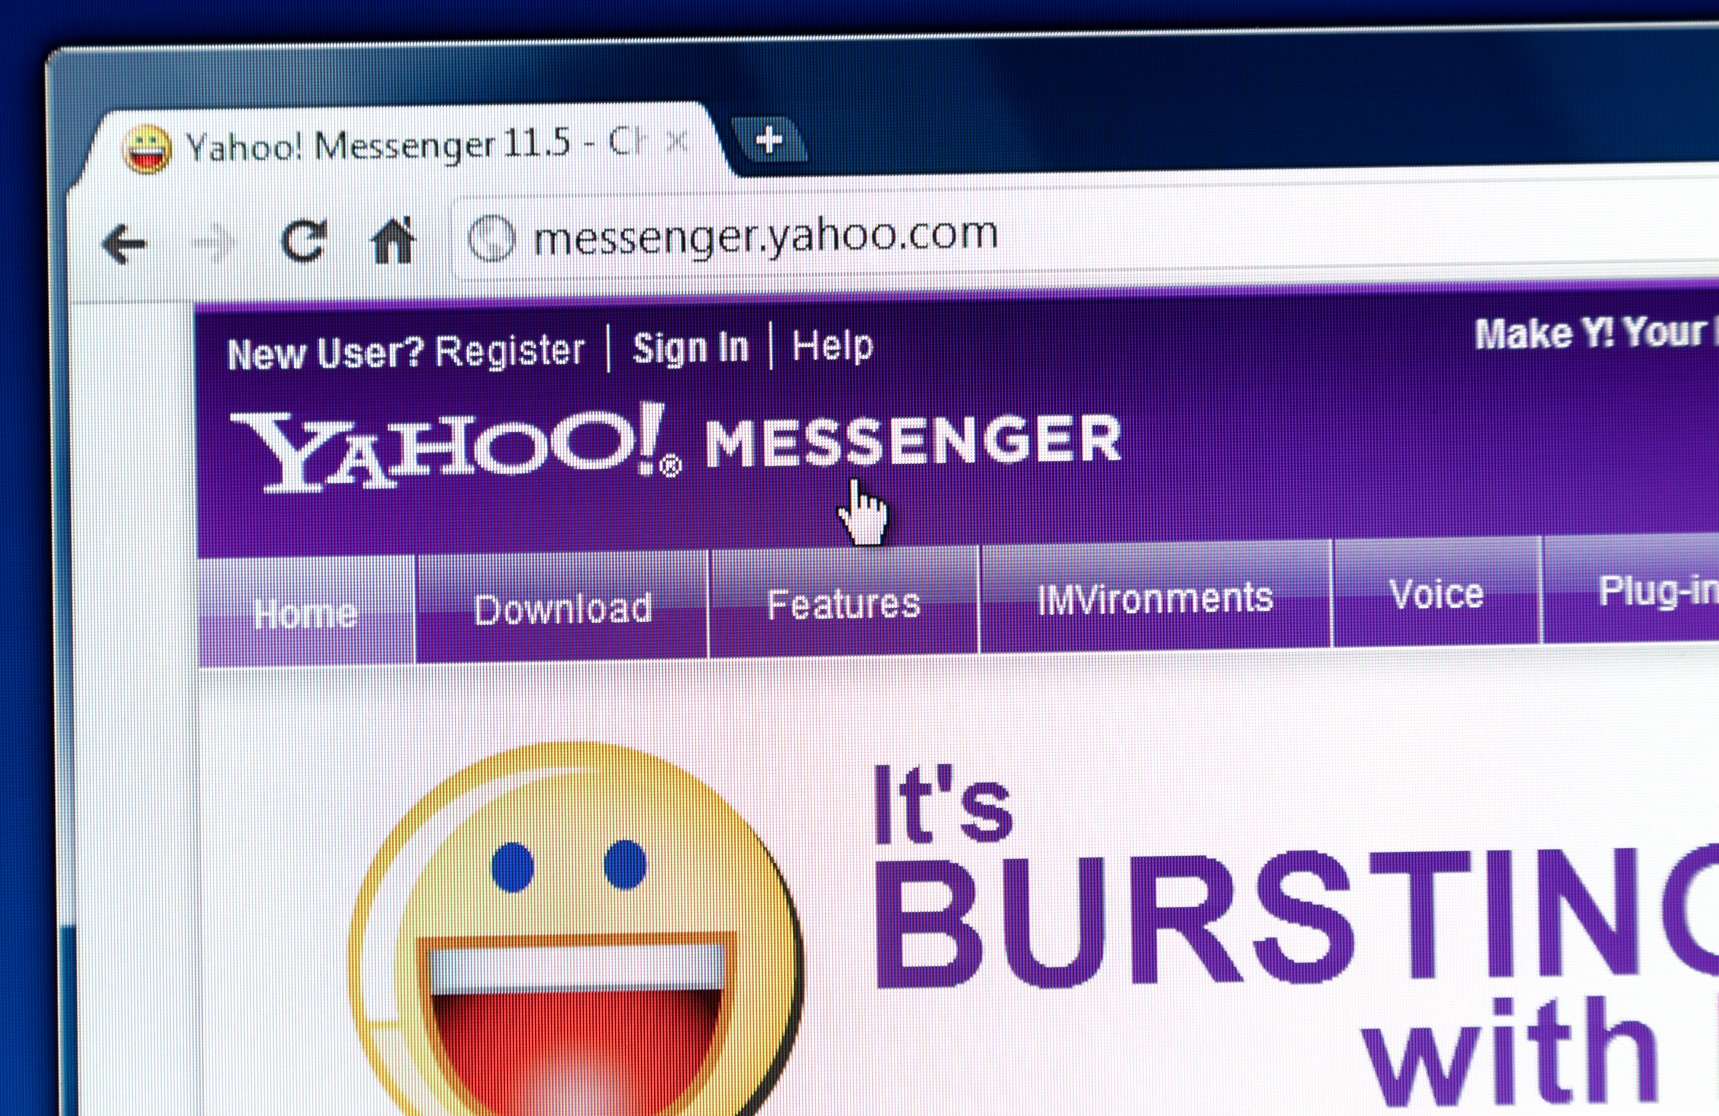 Yahoo-Messenger-on-web-browser-000018765897_Medium_1.jpg